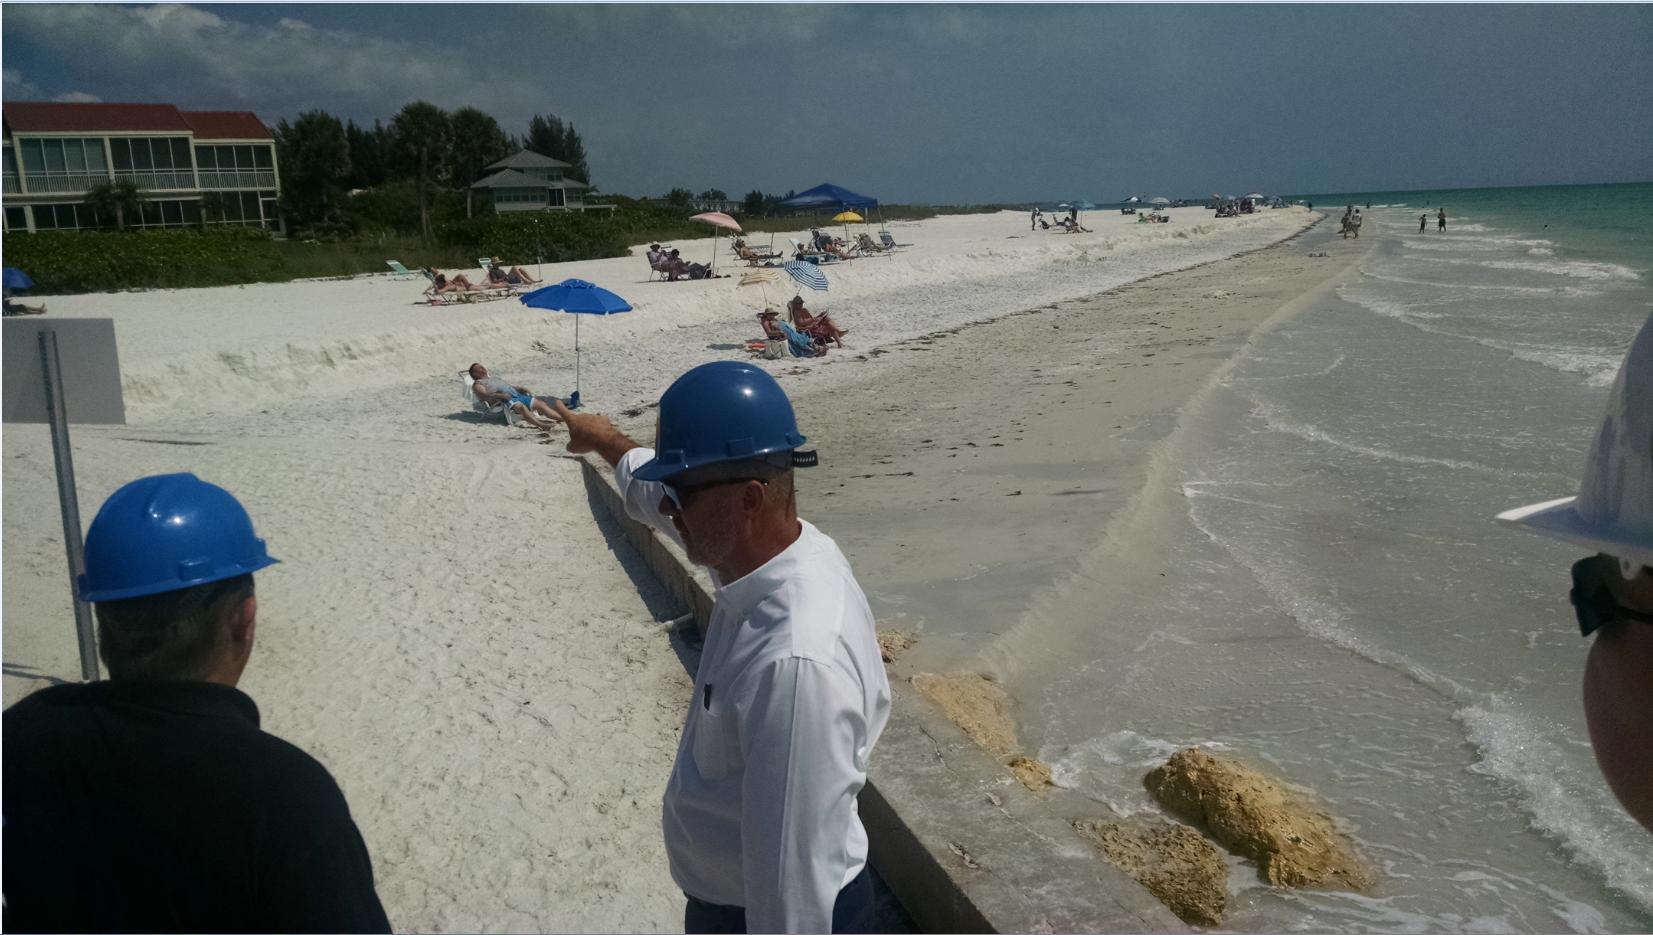 Sand Backup Plan?